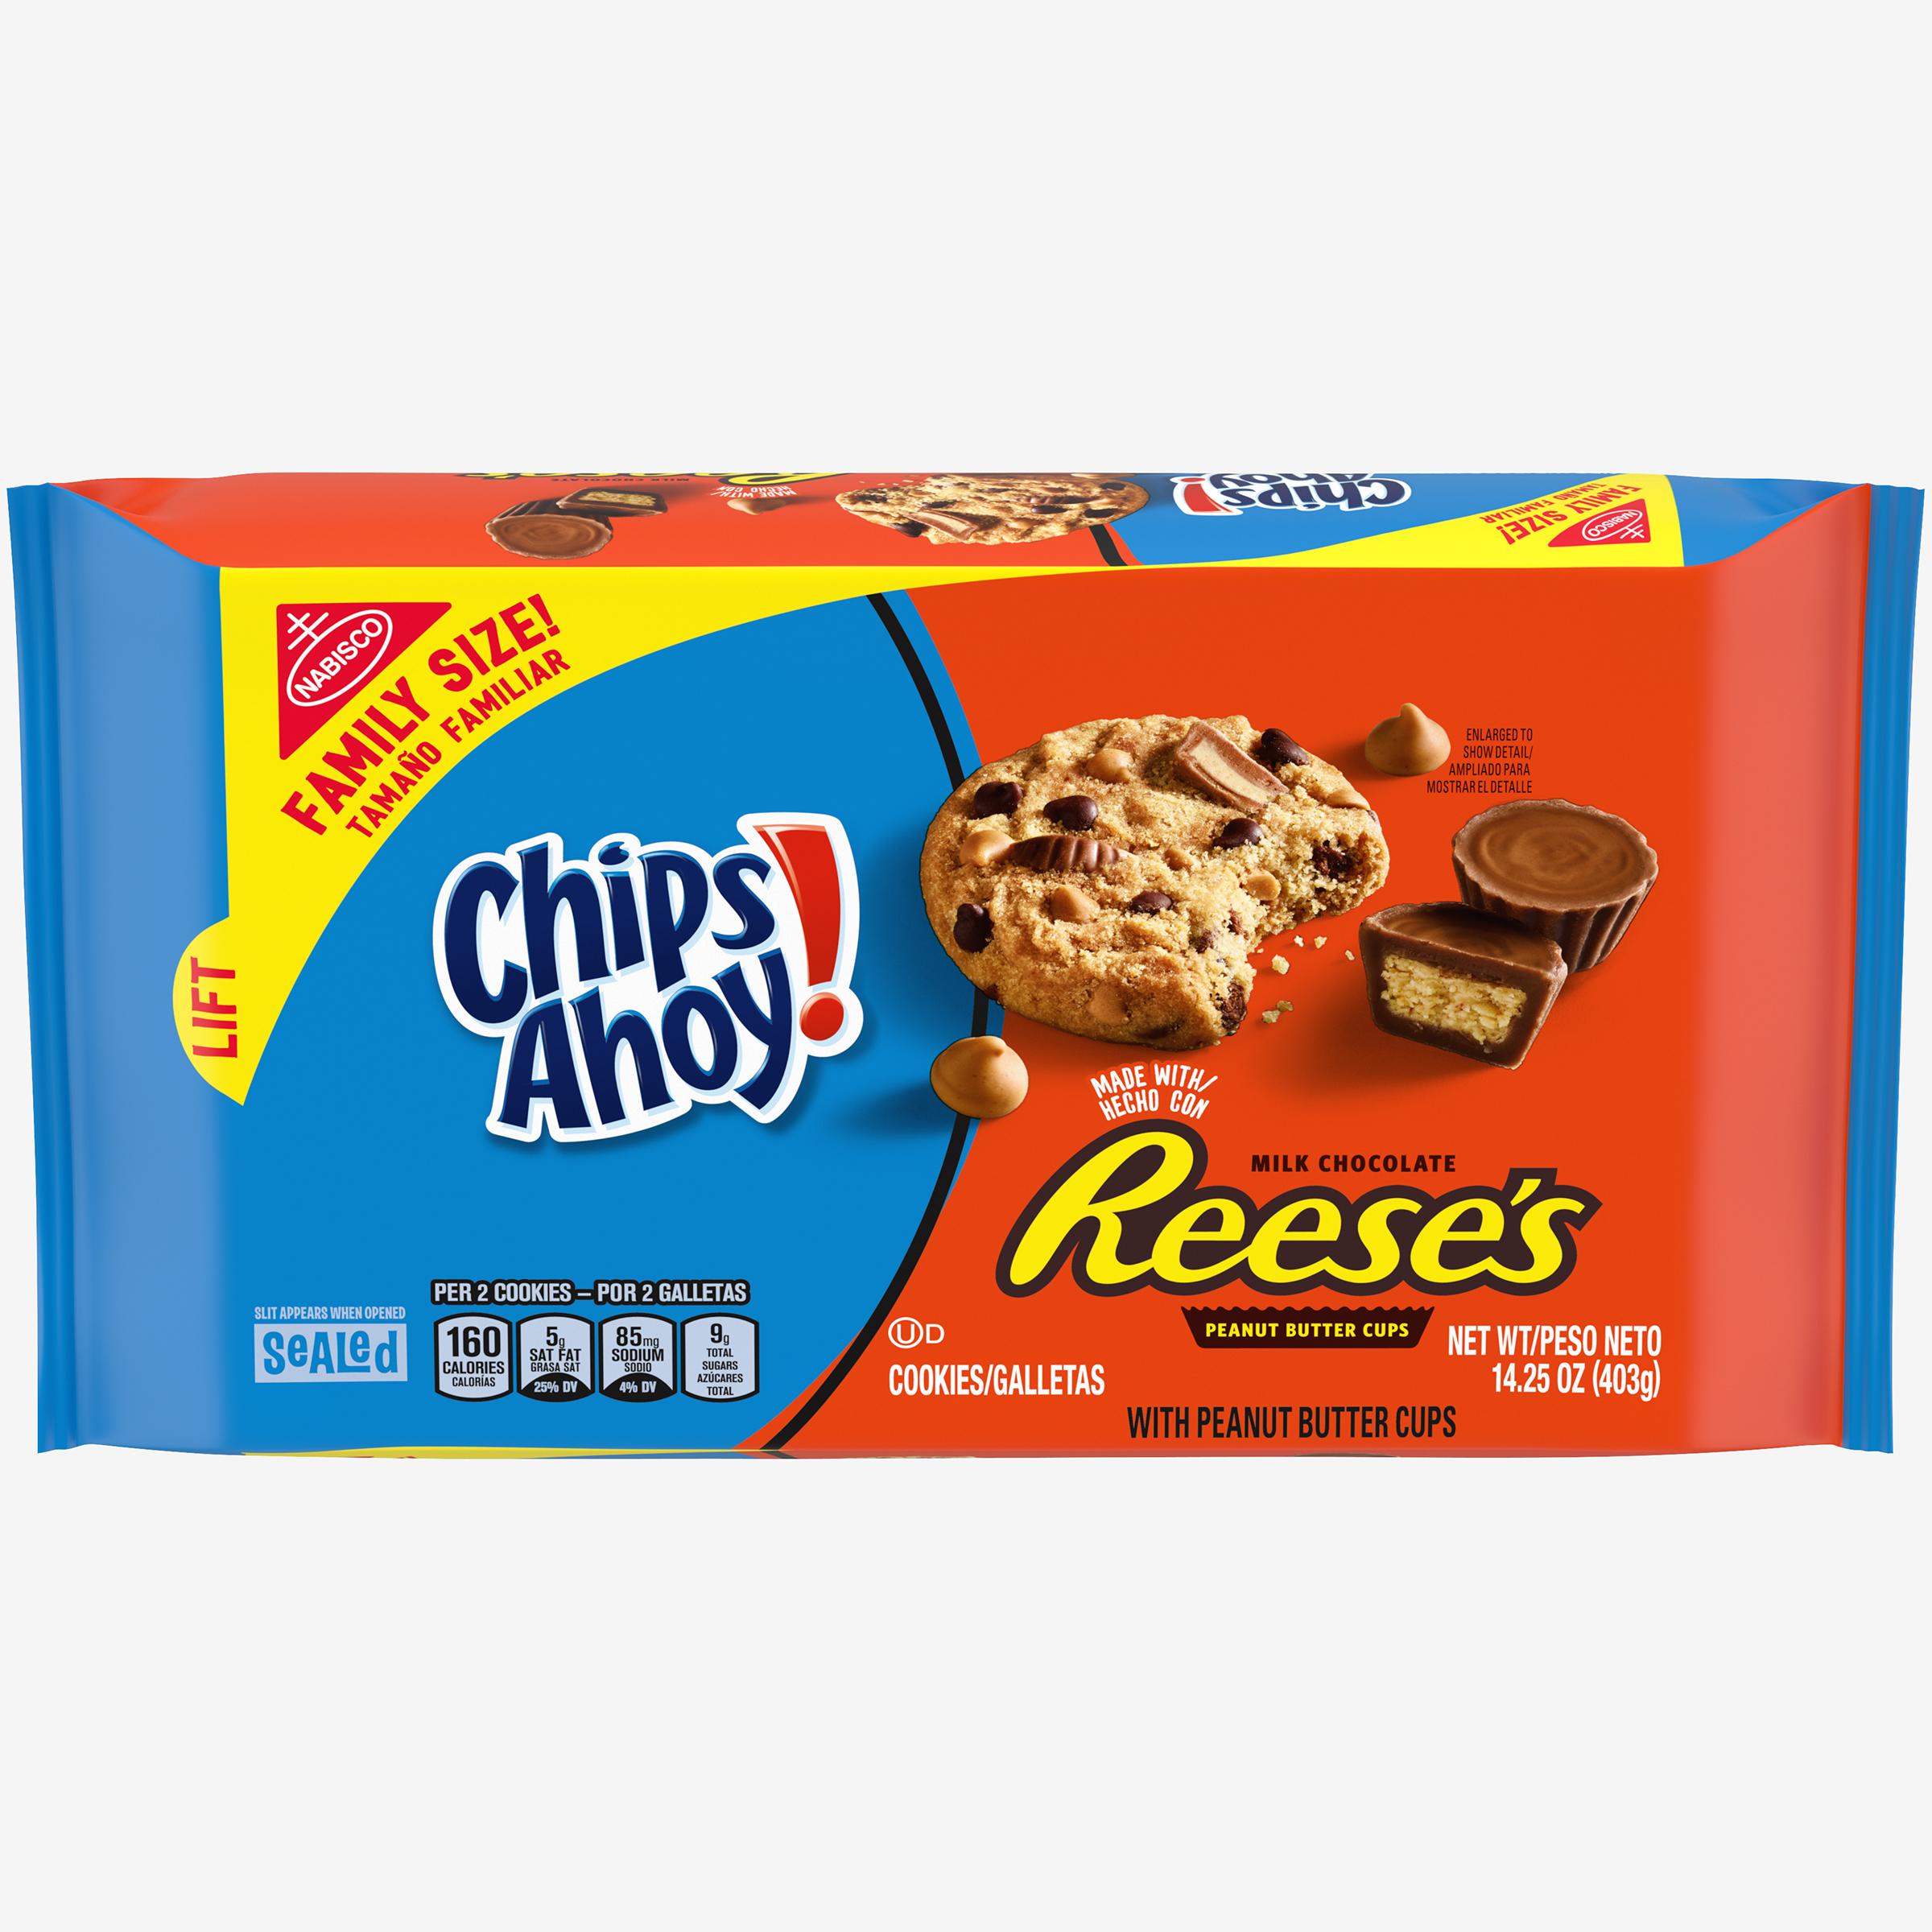 CHIPS AHOY! Original Cookies 14.25 Oz